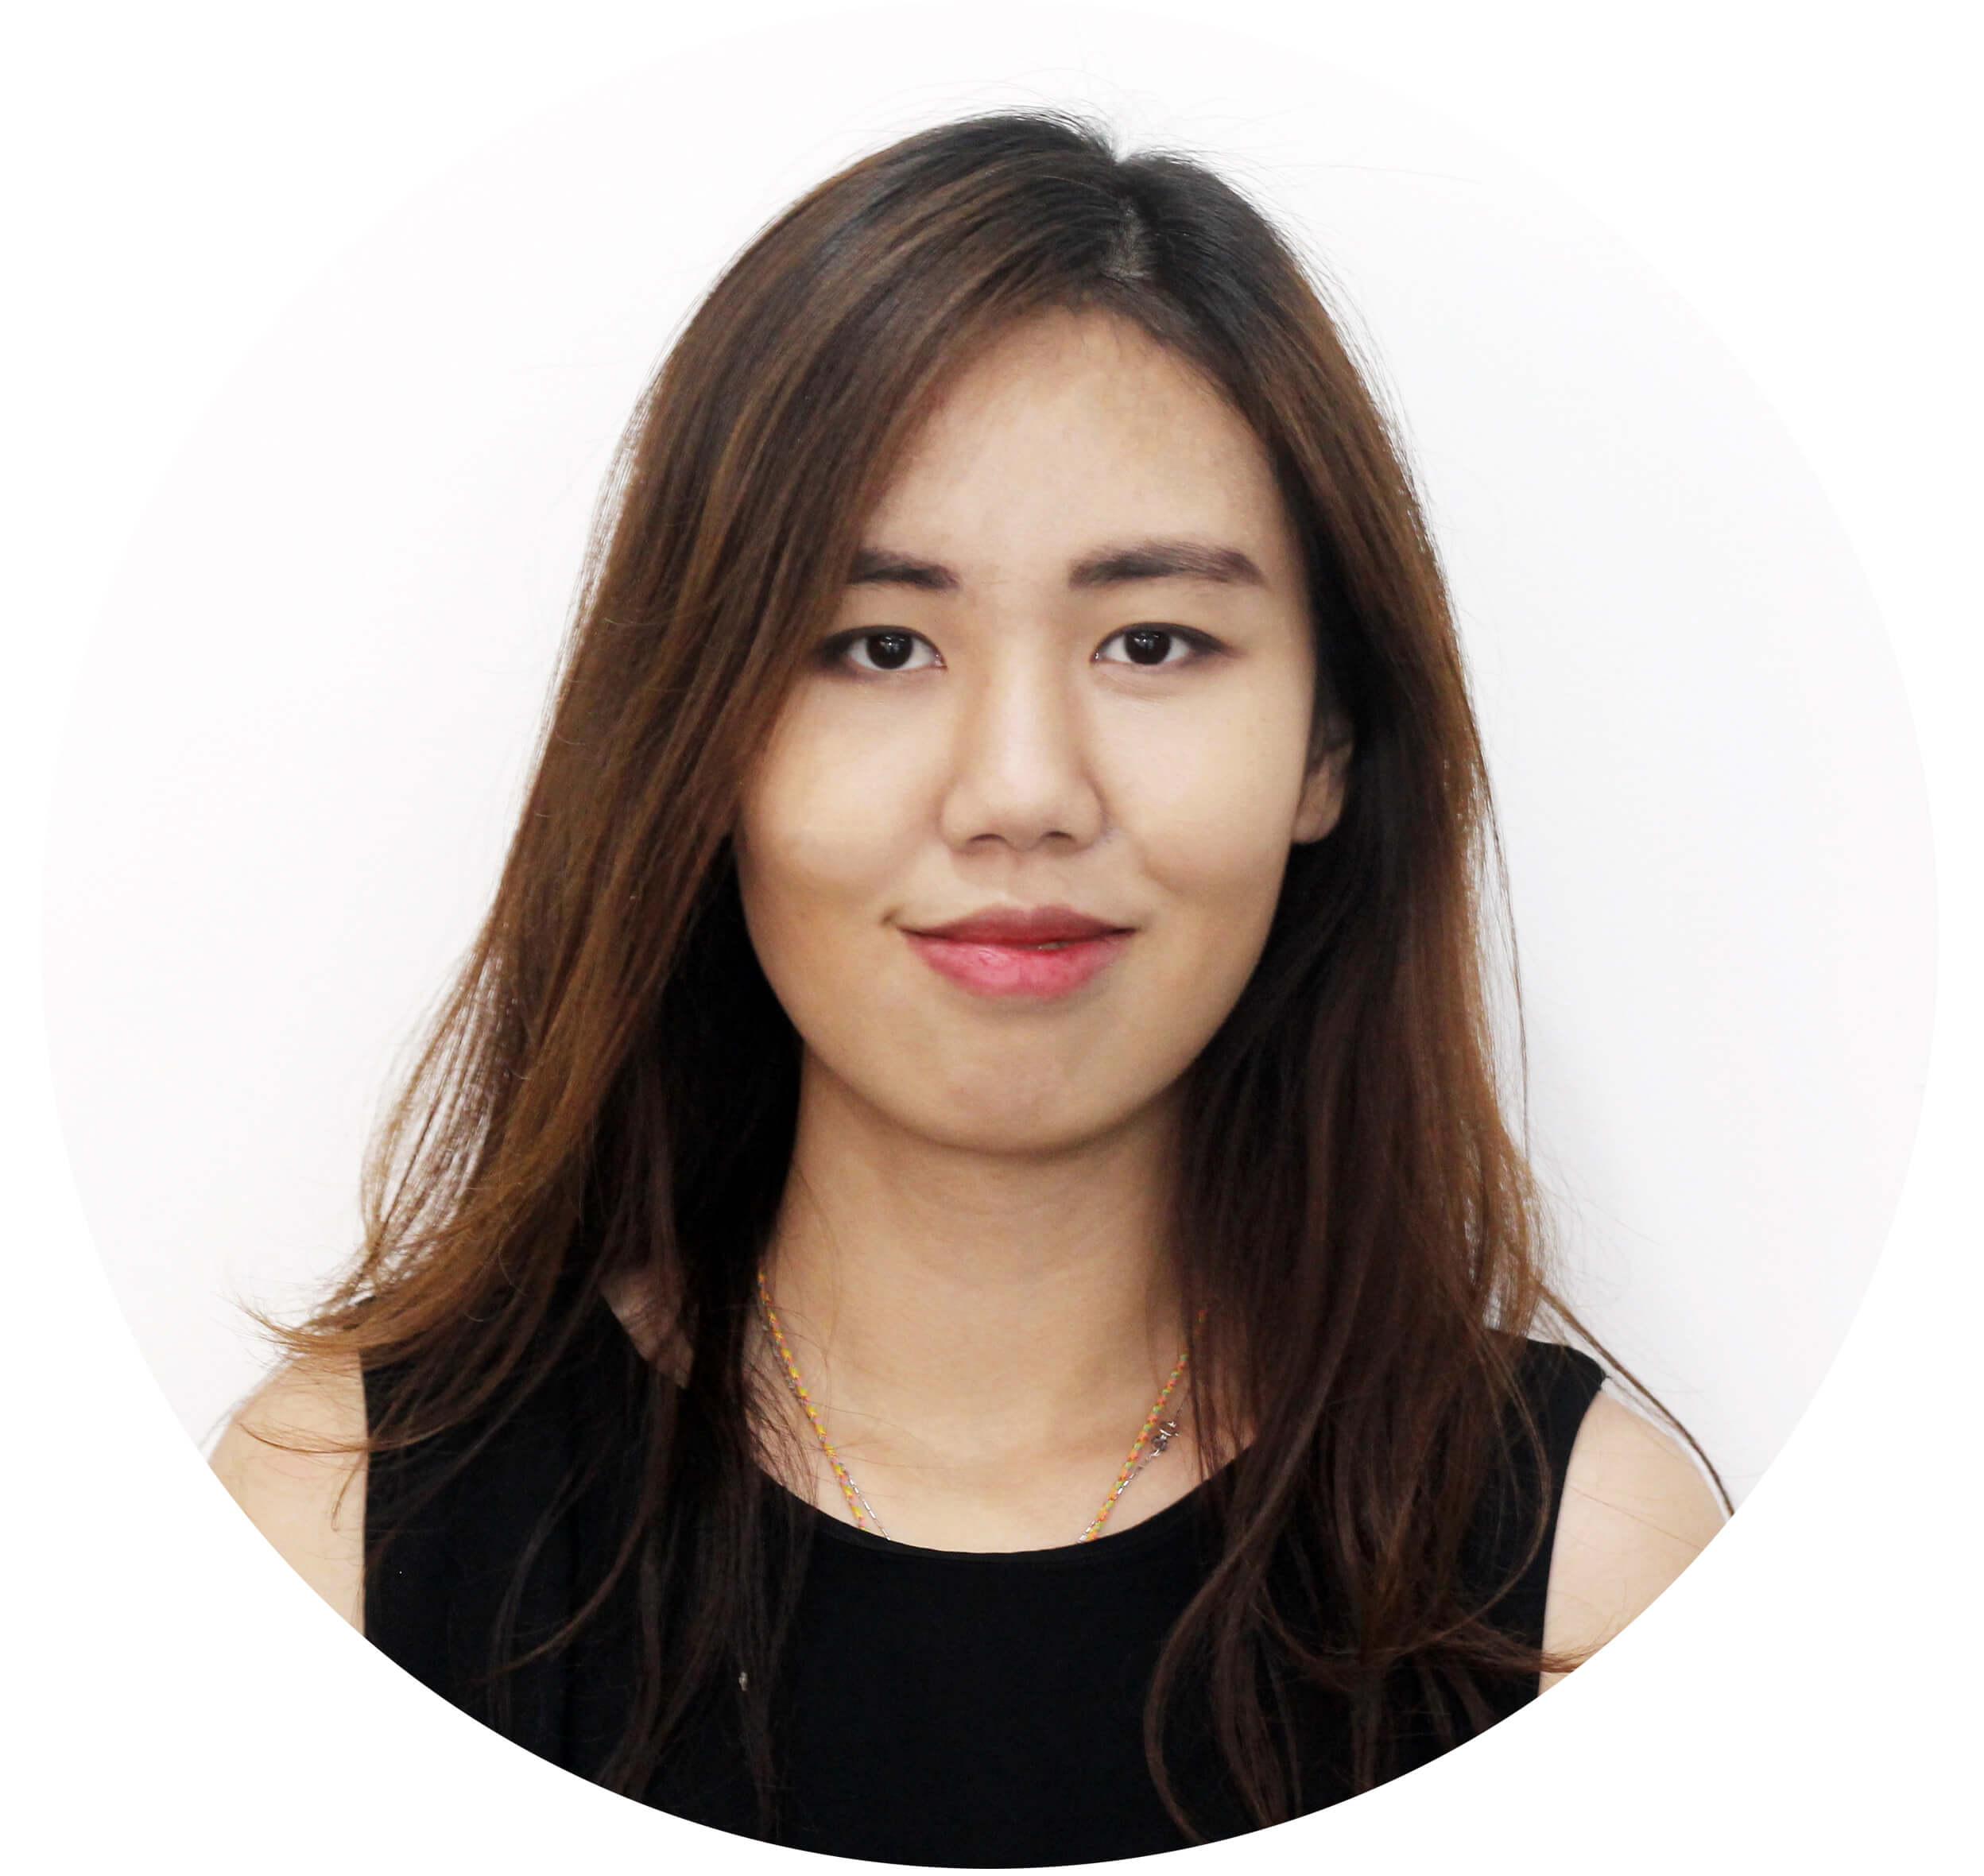 Pham Hoang Phuong Mai